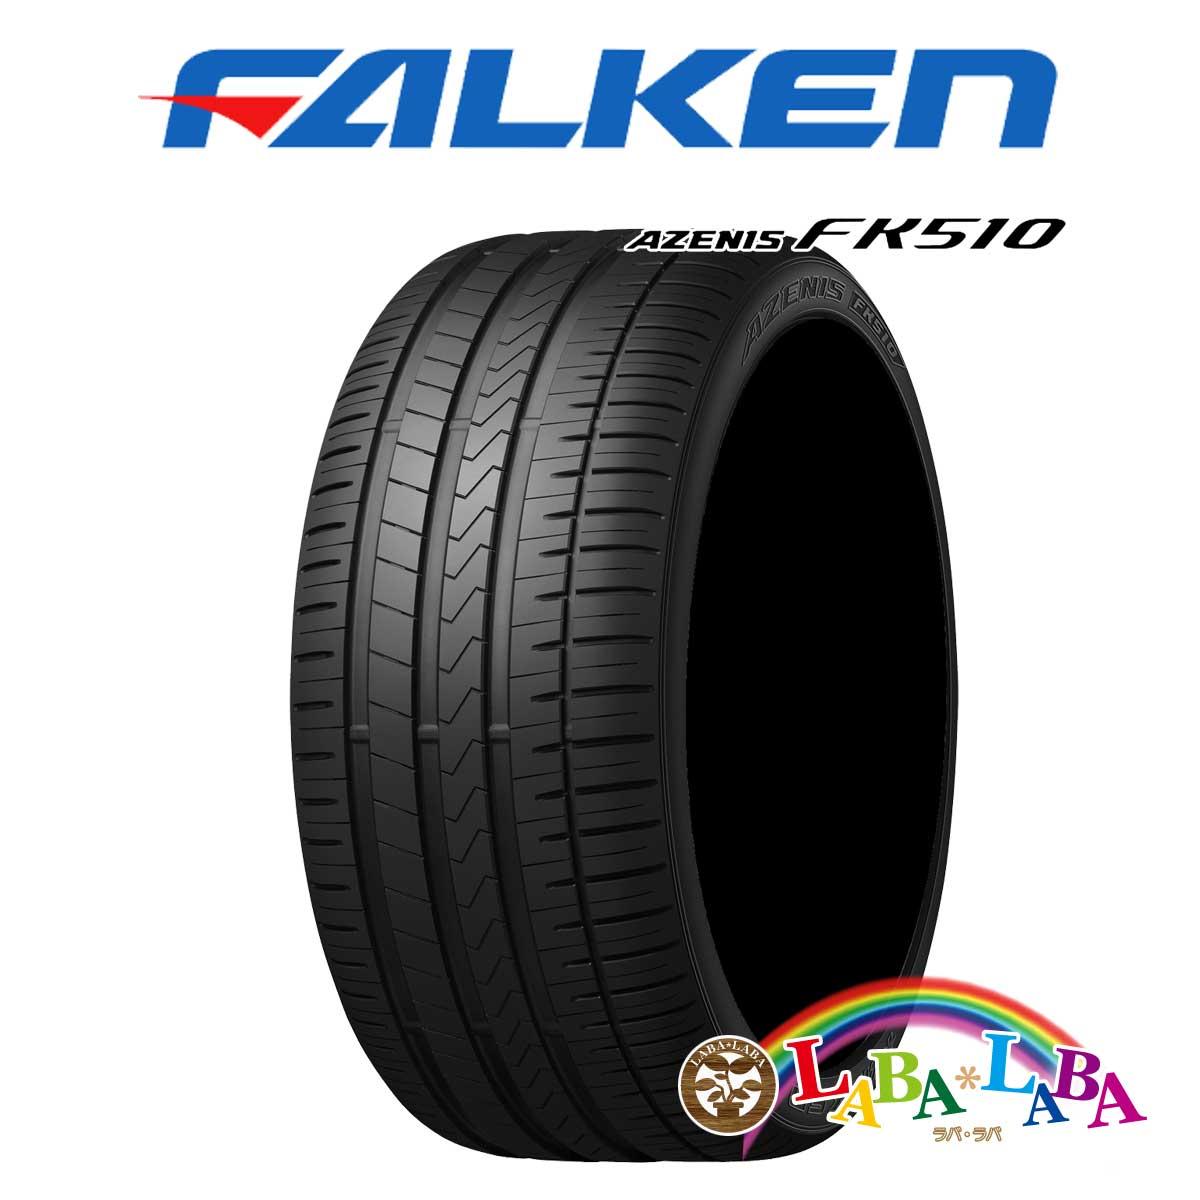 FALKEN ファルケン AZENIS アゼニス FK510 285/30R20 99Y XL サマータイヤ